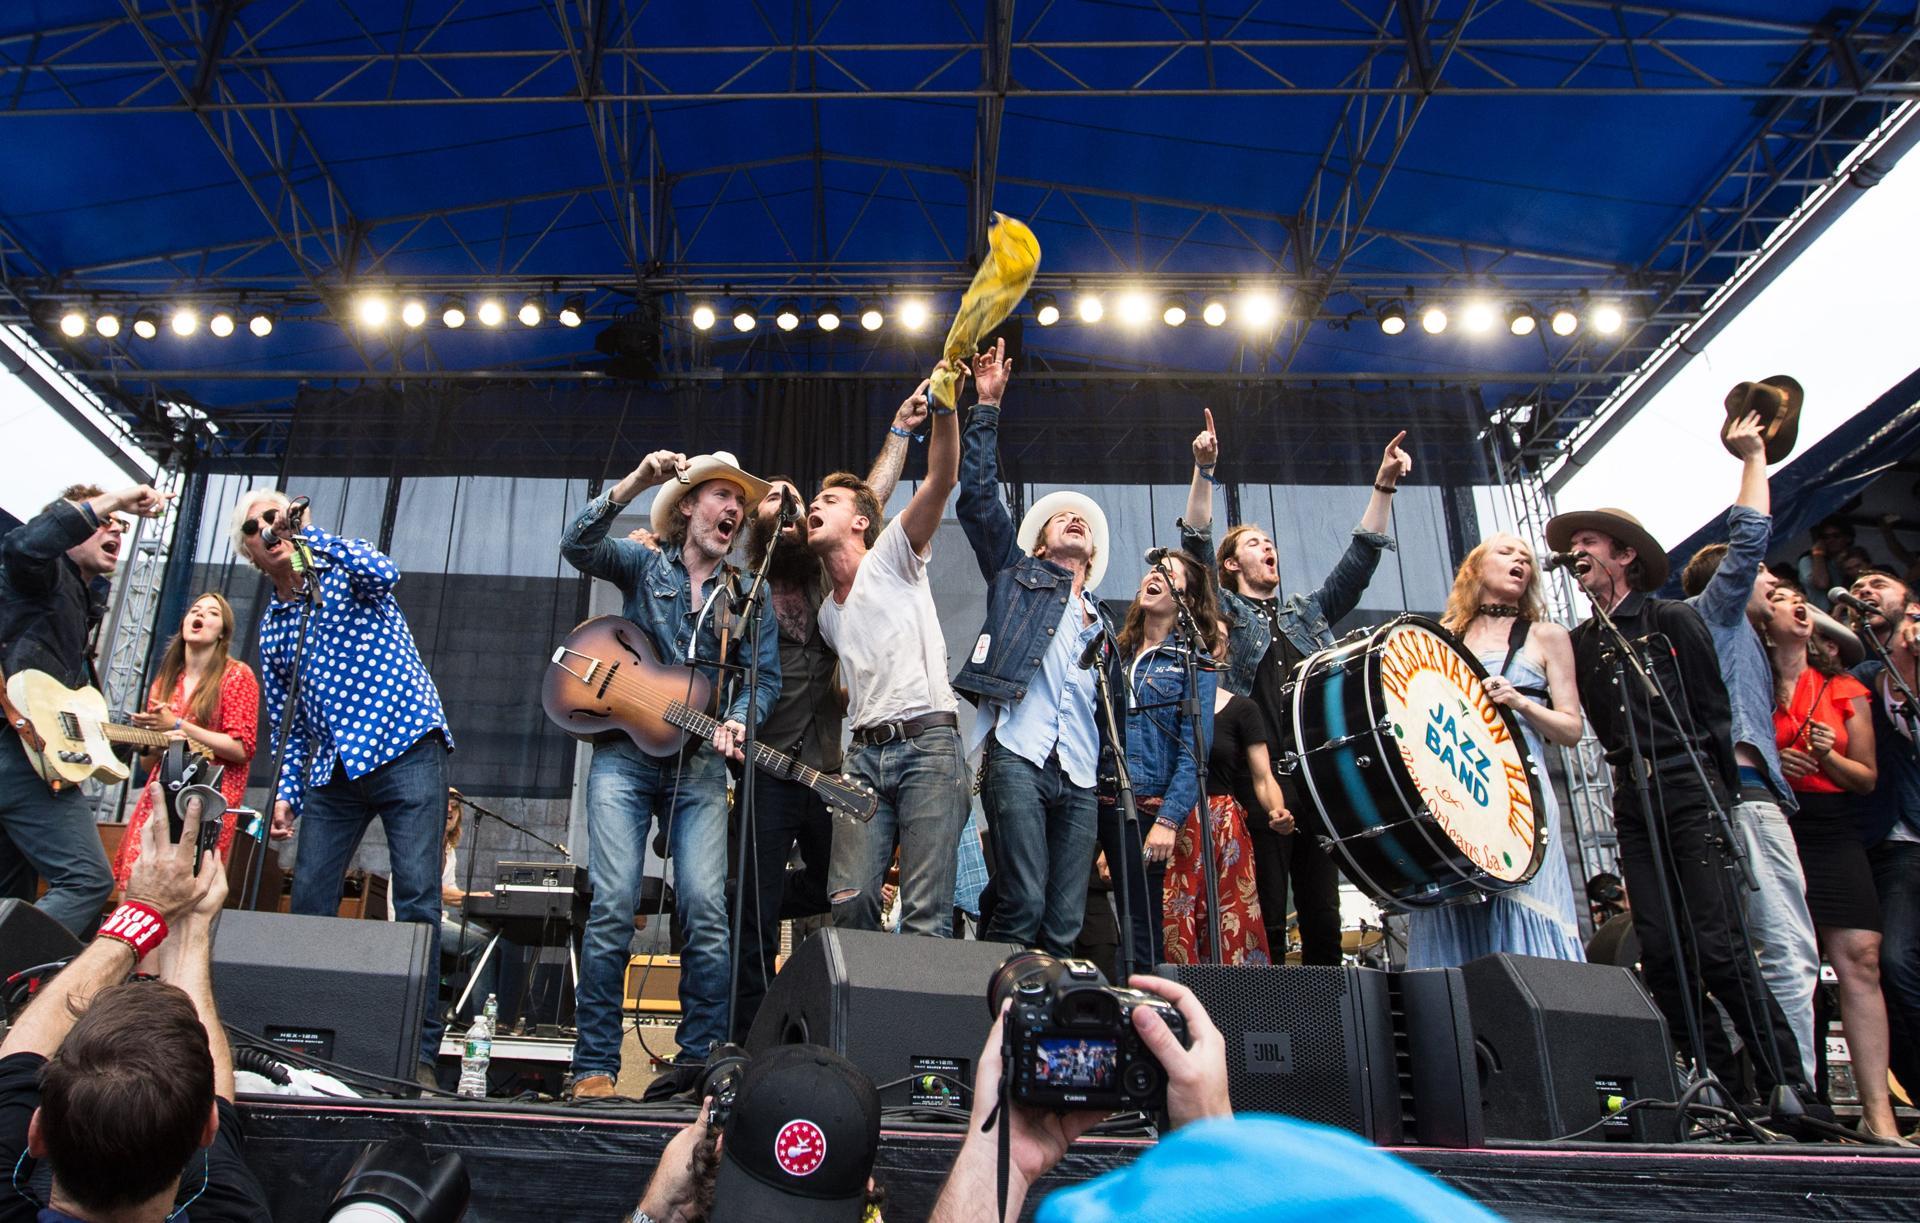 A superjam at the 2015 Newport Folk Festival.